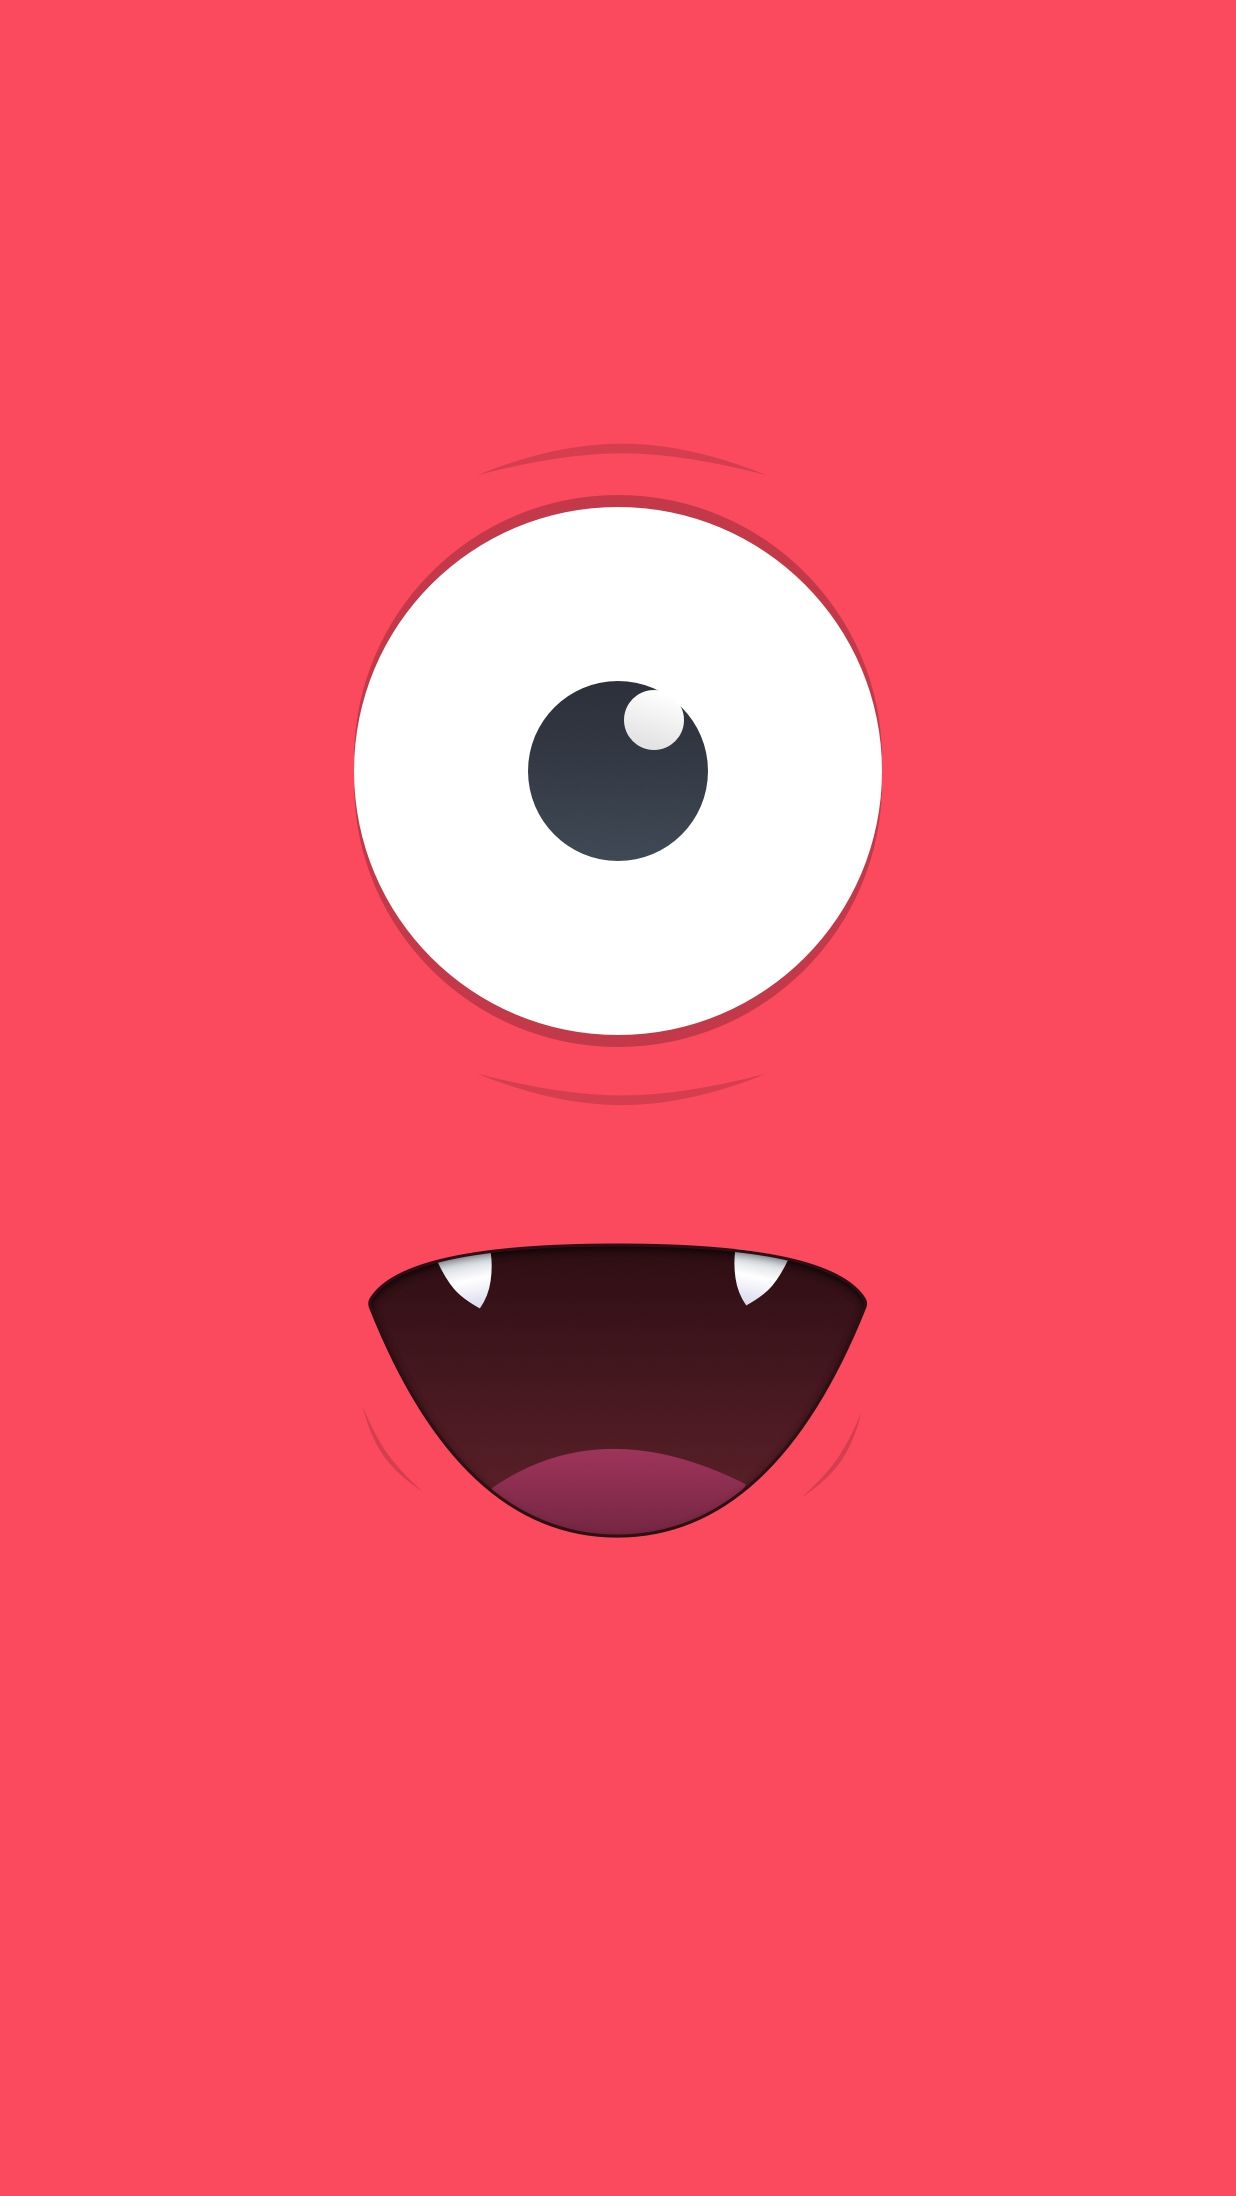 Cute Monster Wallpaper Iphone Cute Red Monster Iphone Wallpaper Iphone Wallpapers